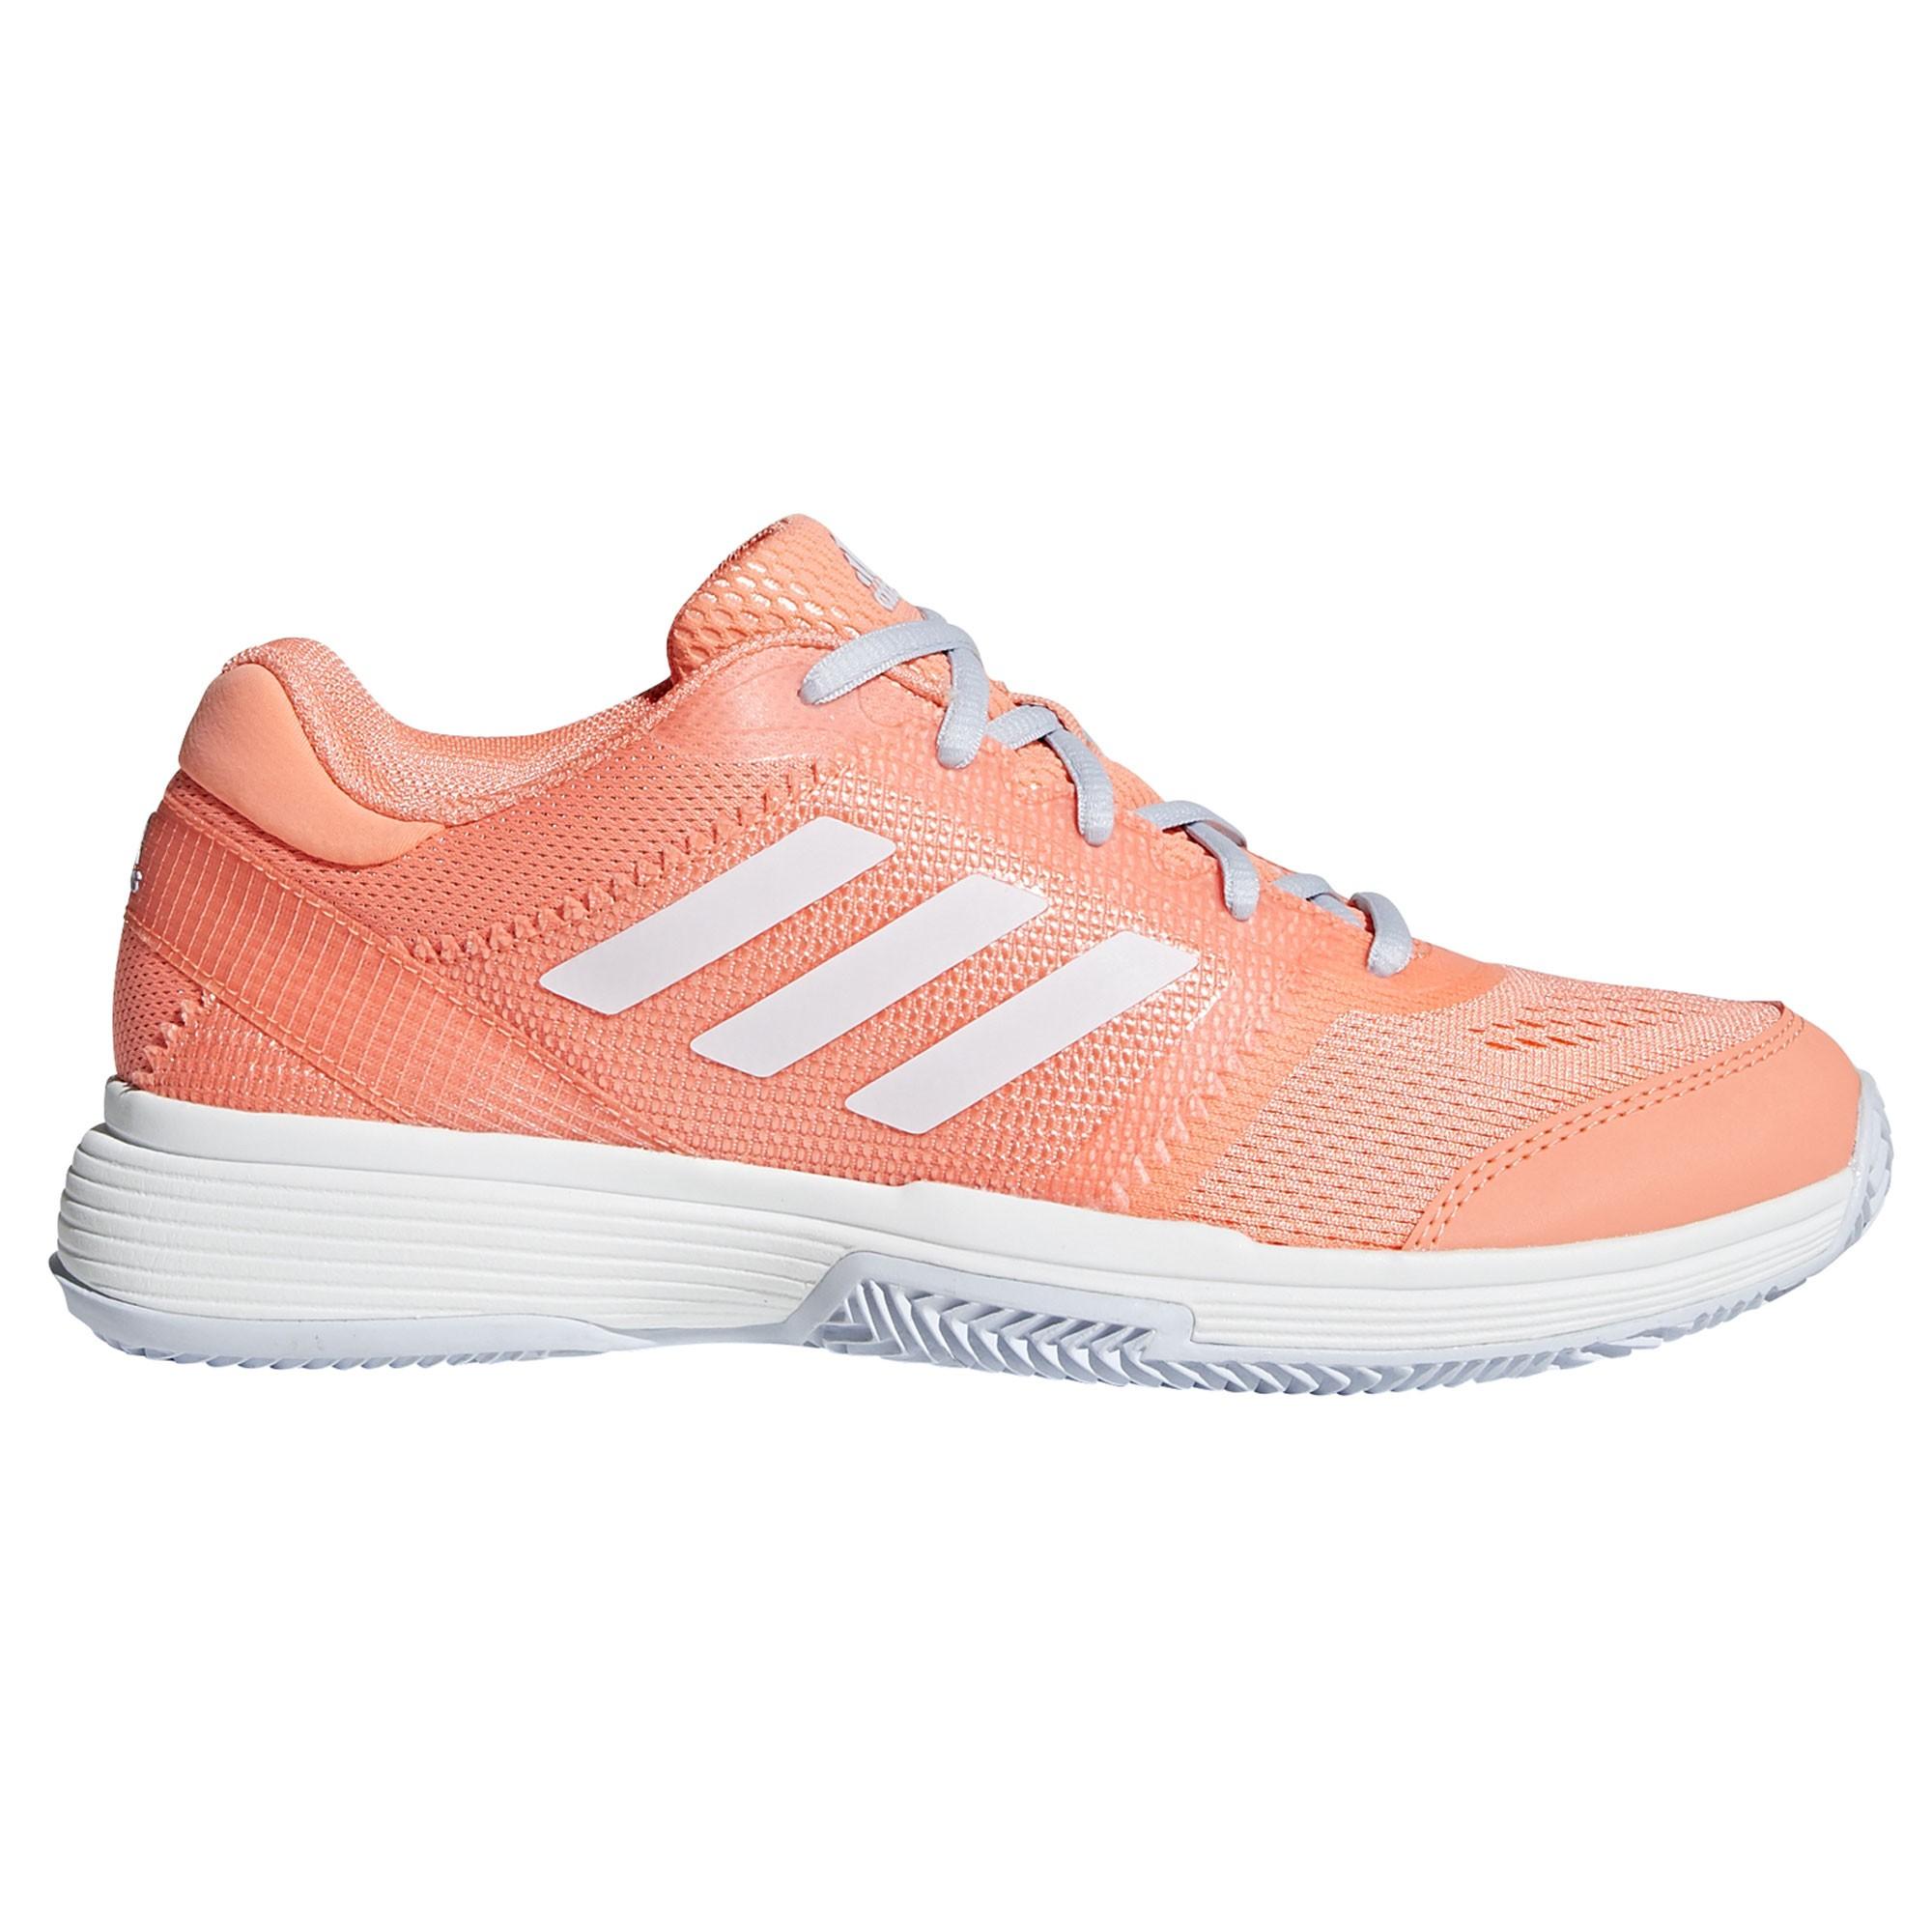 Afbeelding van Adidas Barricade Club Clay CM7812 Tennisschoenen Dames Chalk Coral Footwear White Aero Blue